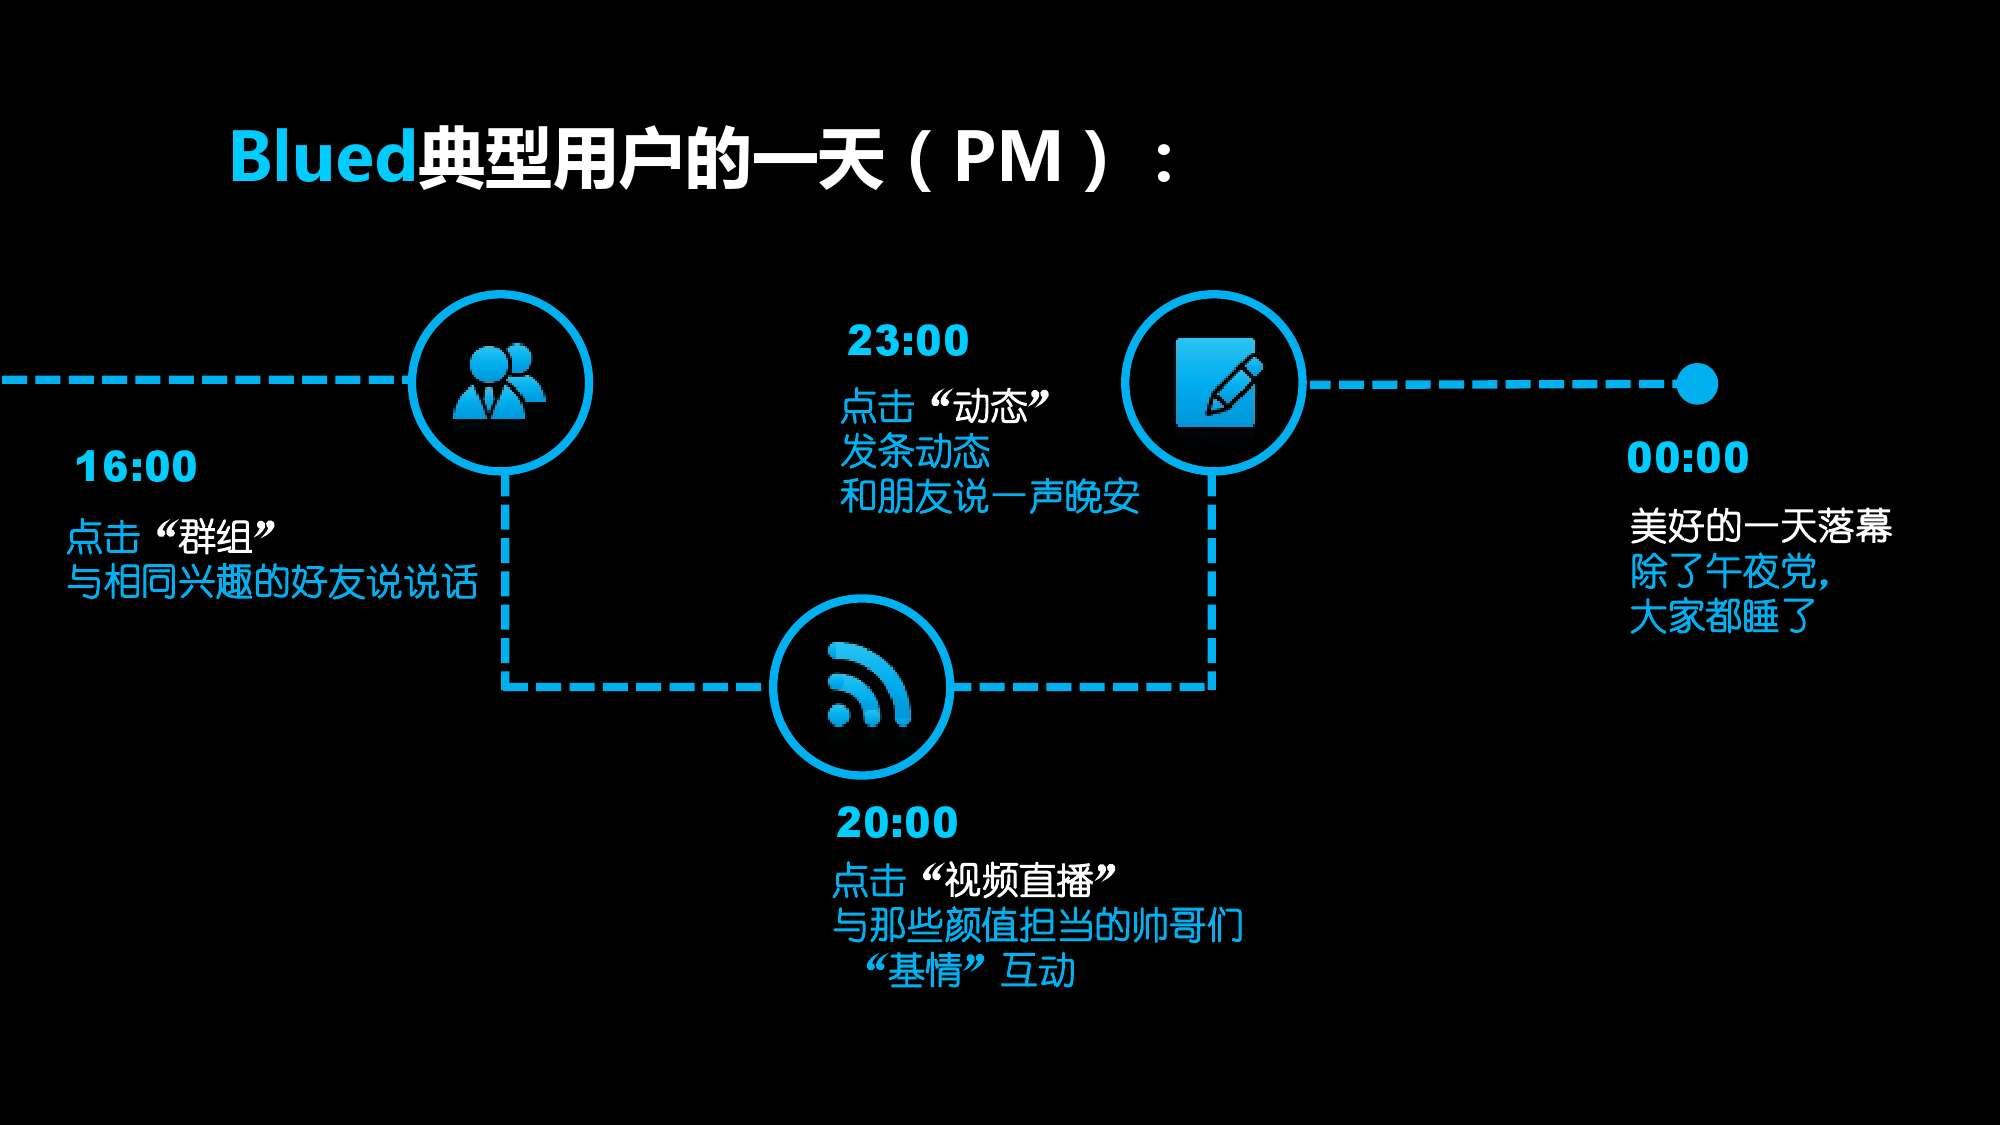 Blued2015中国同志社群大数据白皮书_000019